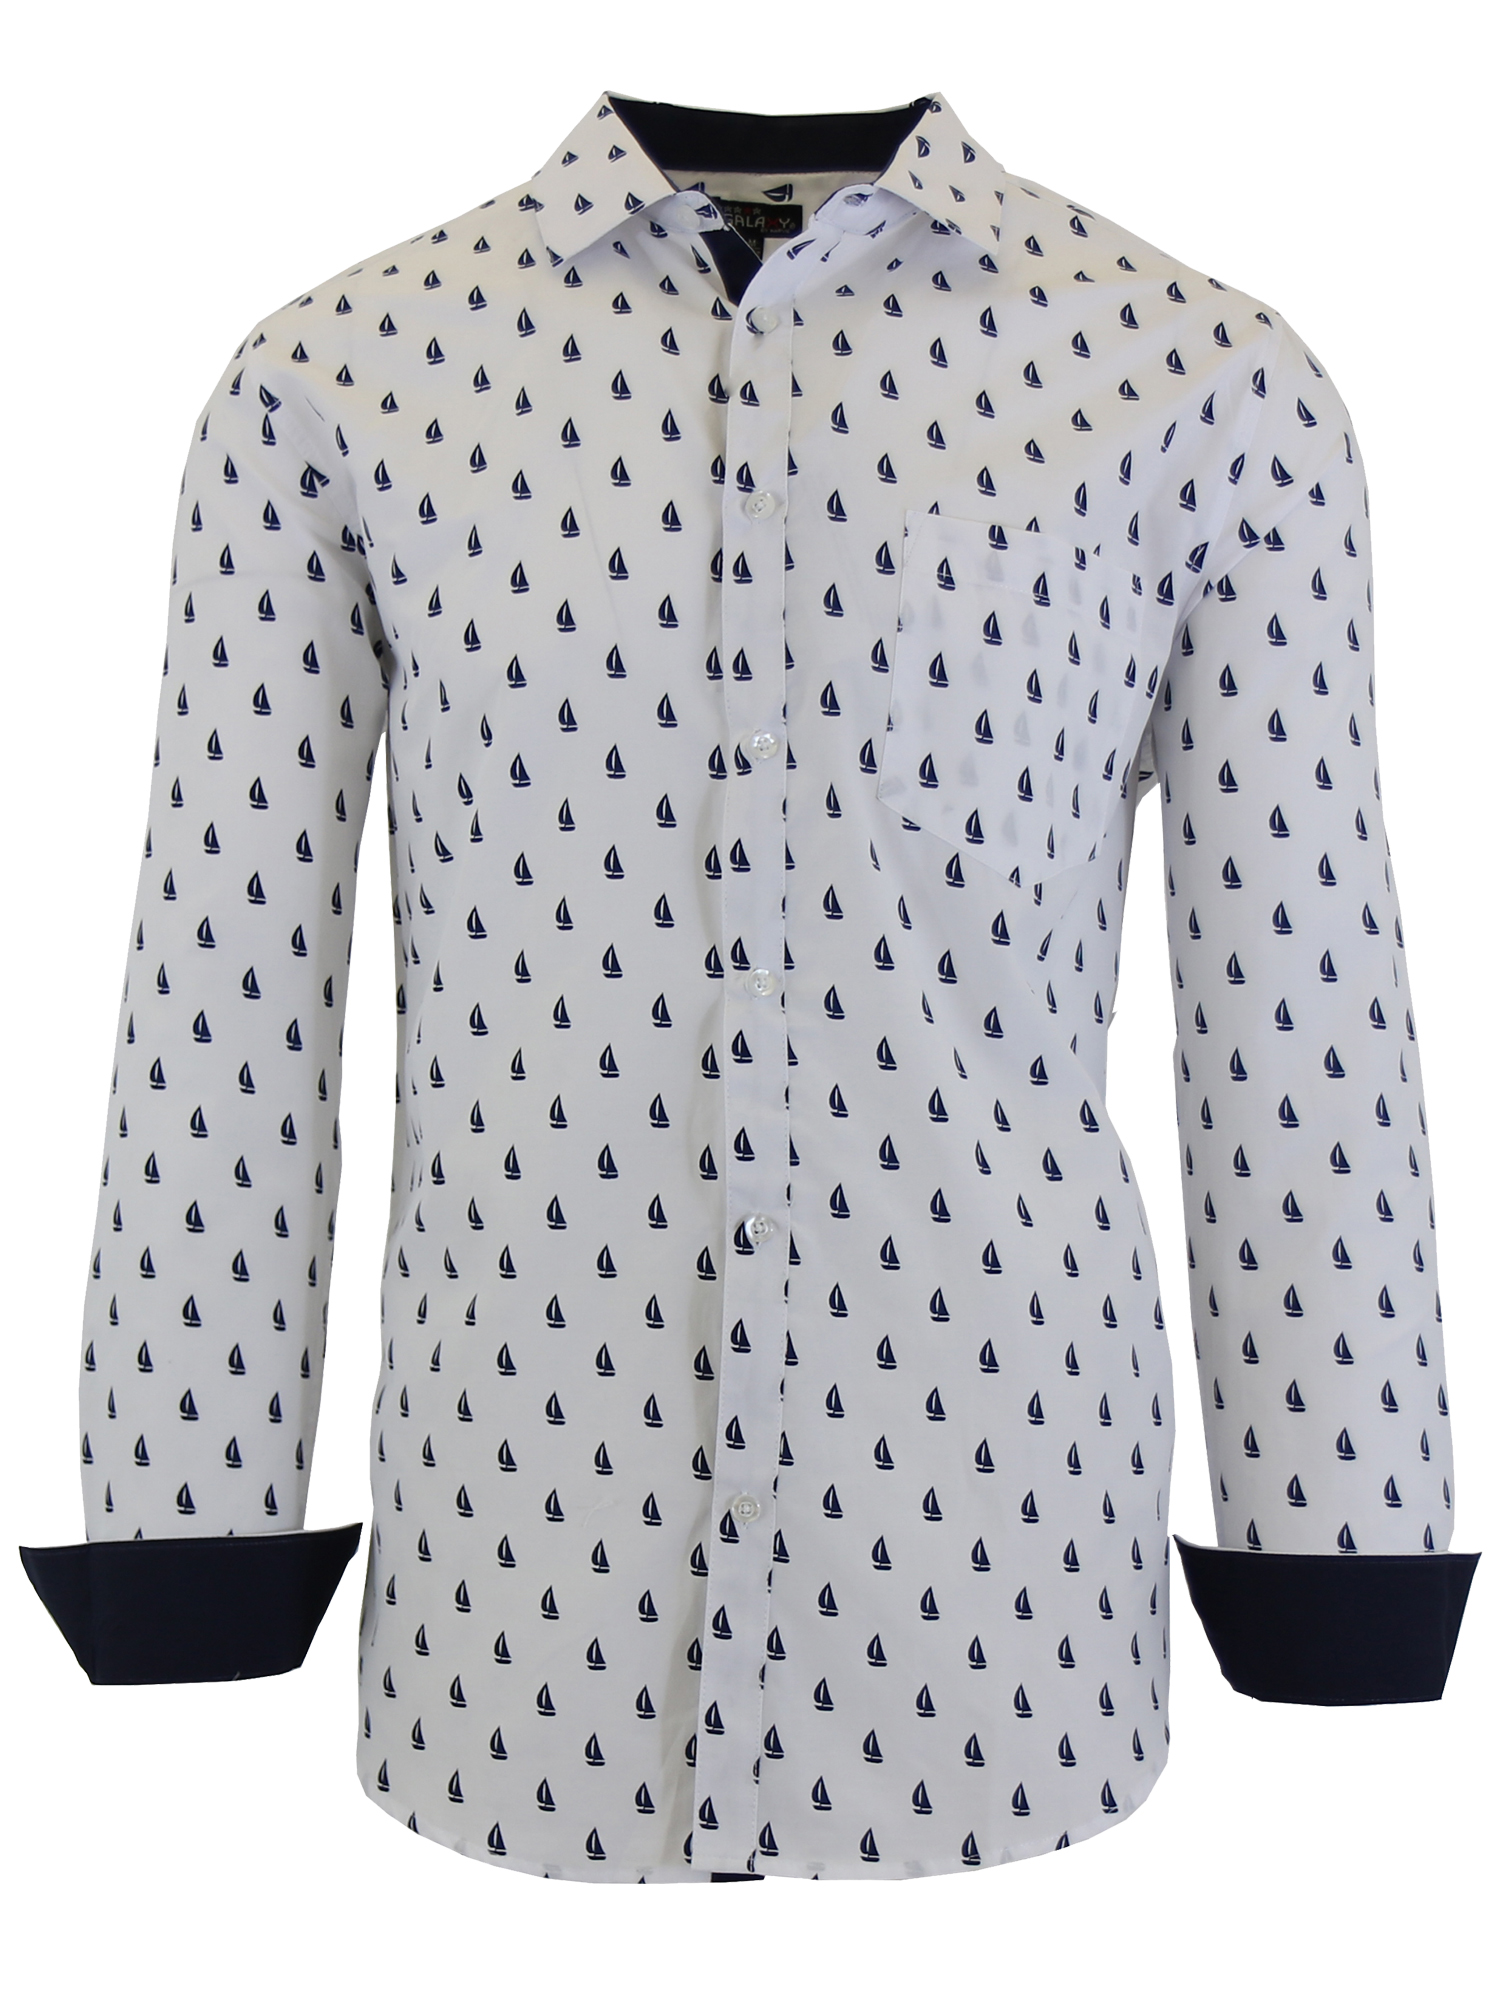 Mens VERTICAL Casual Short Sleeve Button Shirt Black Gray Trim w// Chest Pockets